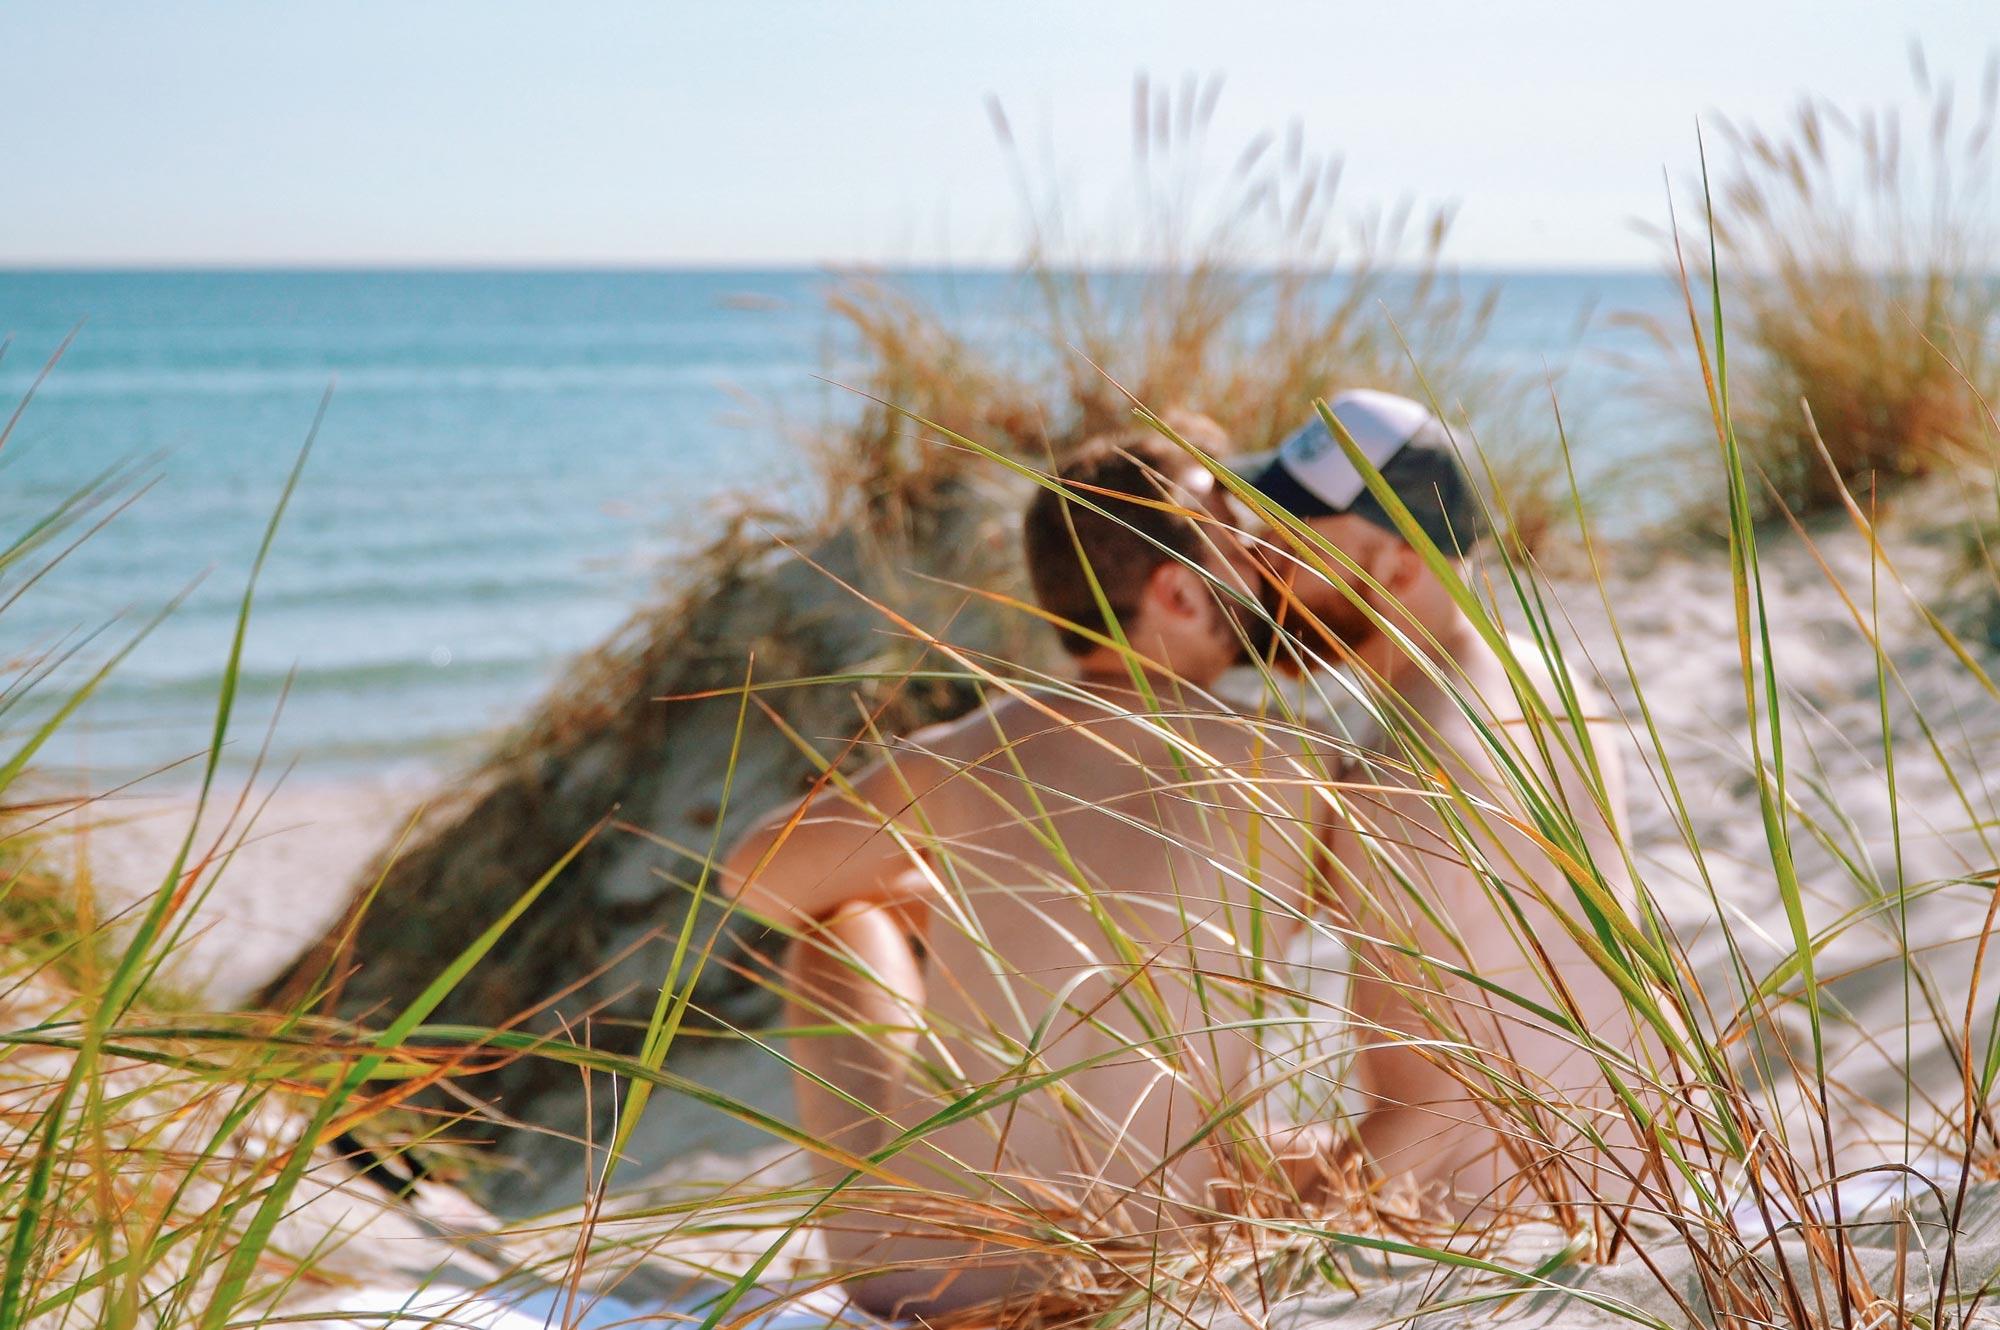 Gay Summer Road Trip Skåne A naked kiss at the clothing optional gay beach of Sandhammaren © Coupleofmen.com